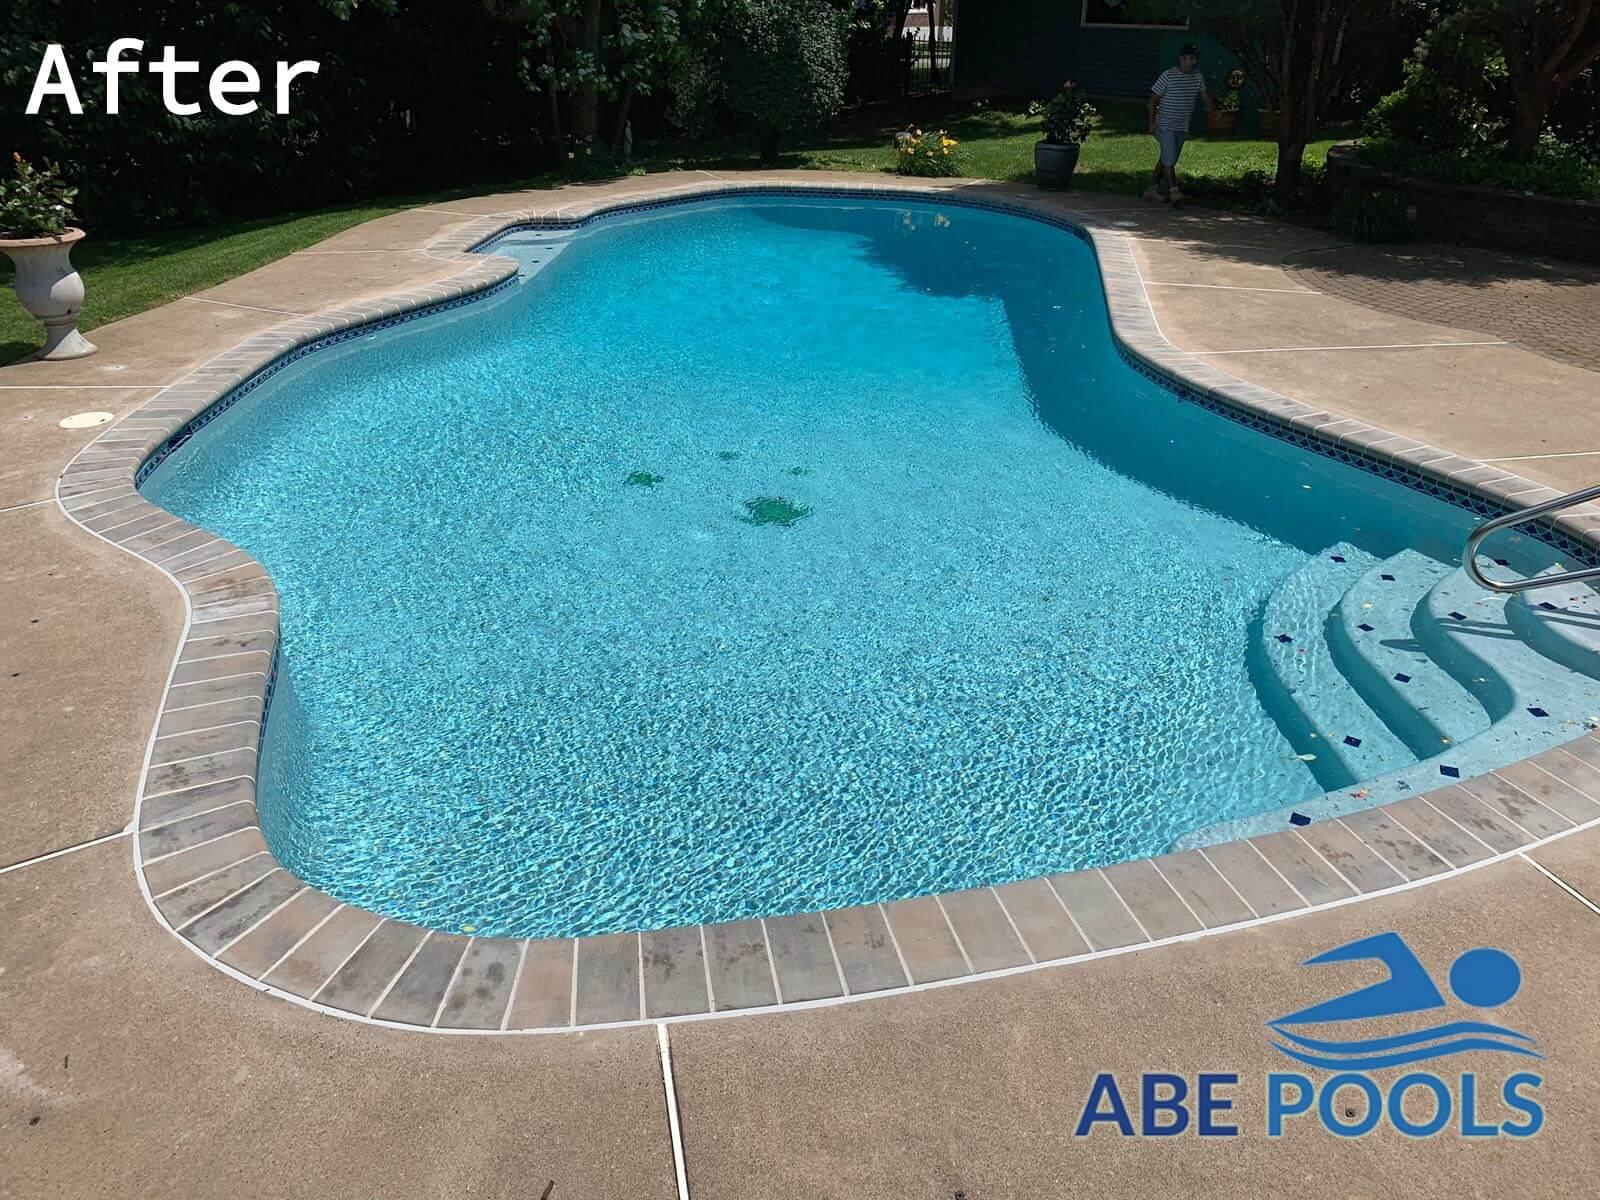 Concrete pool resurfacing